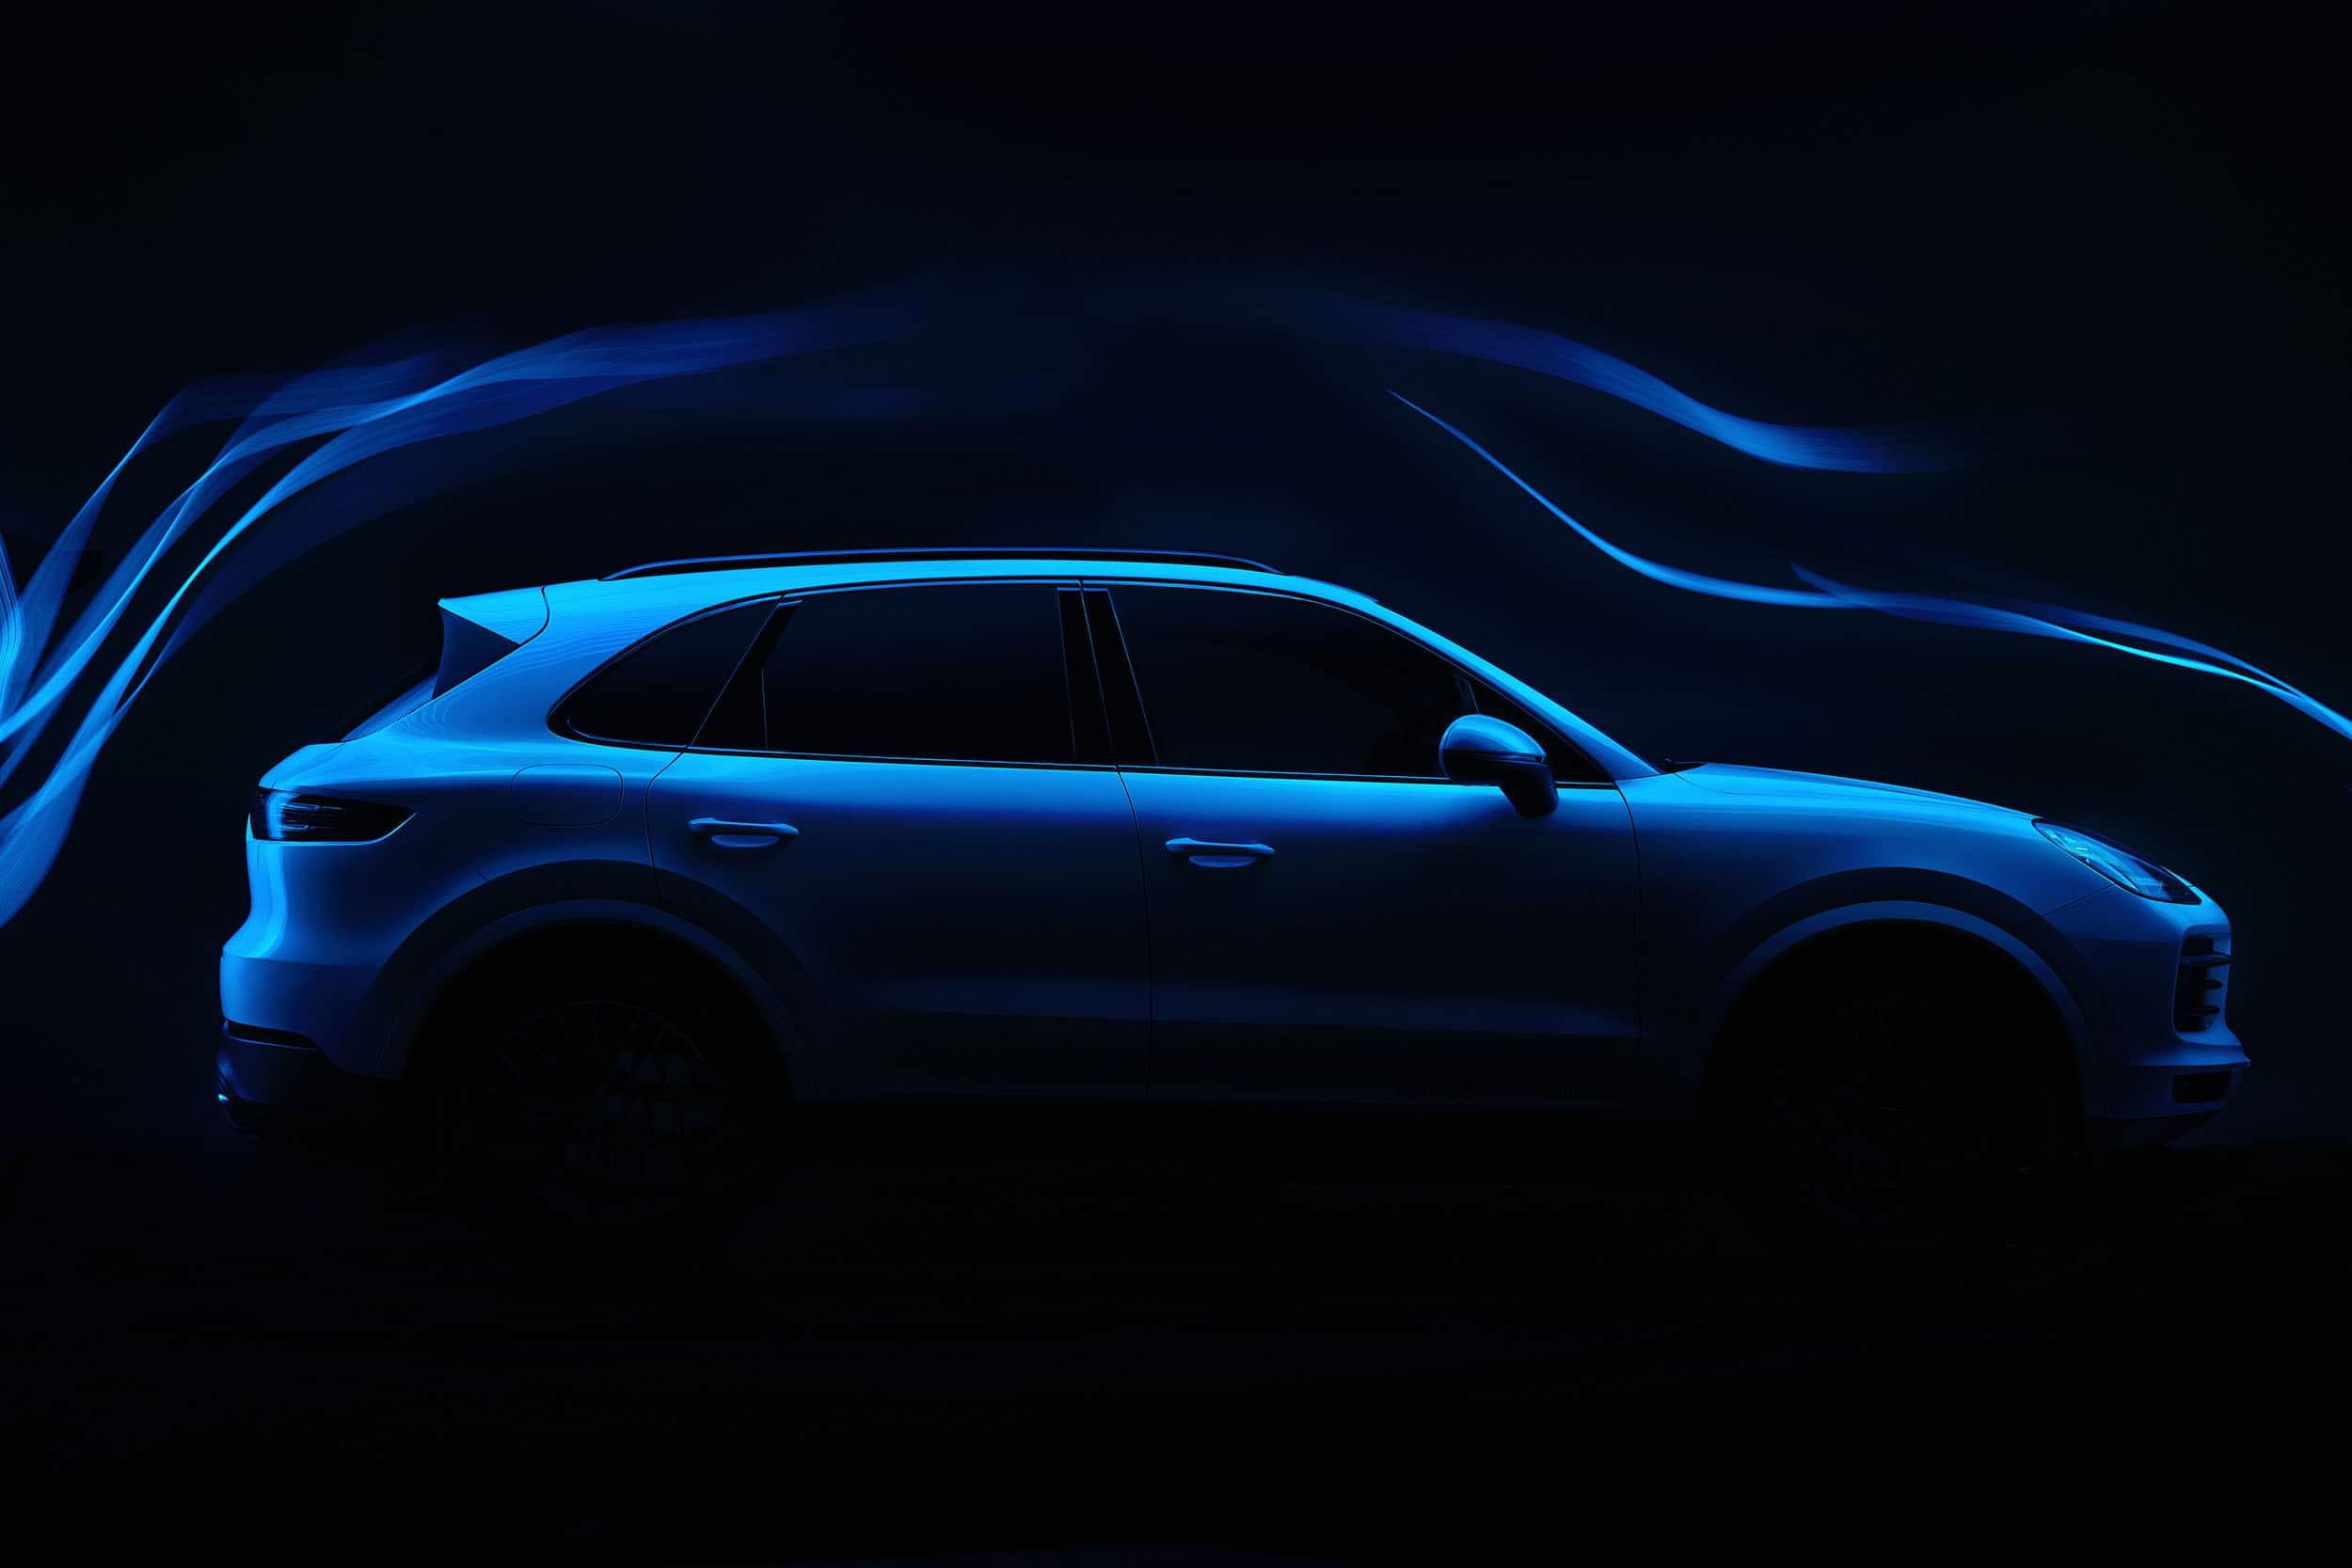 studio-ignatov-wkw-automotive-imagekampagne-04